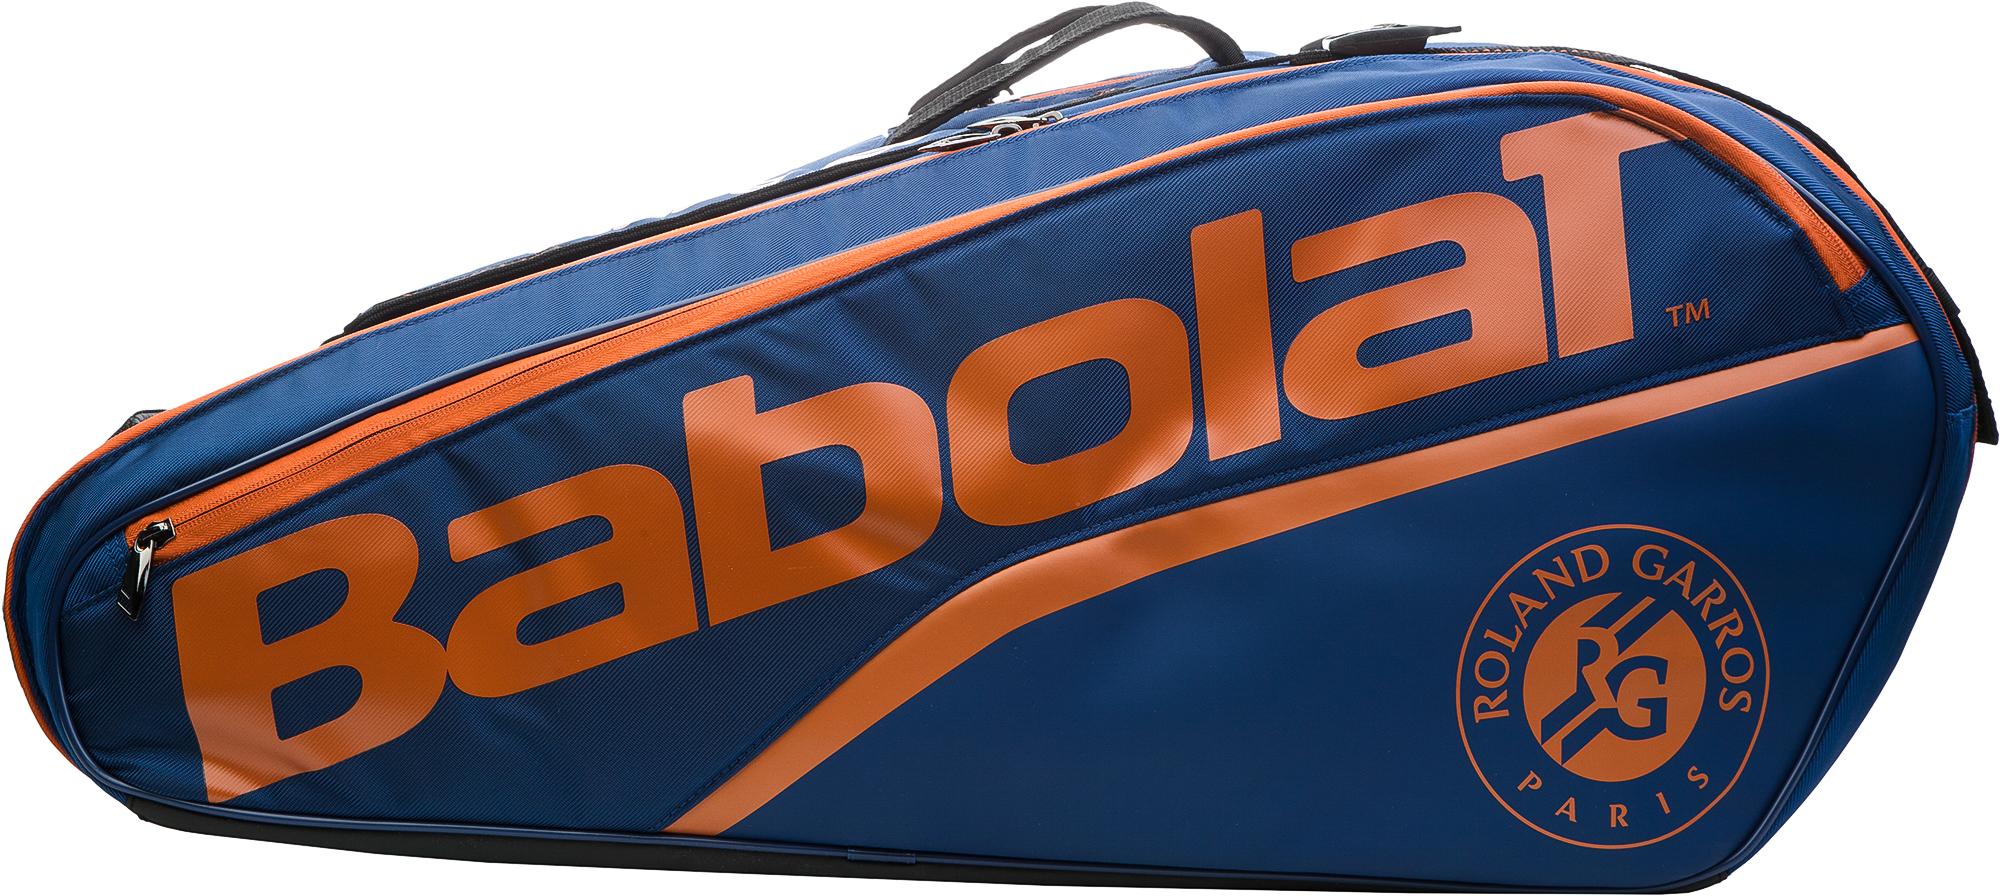 Babolat Сумка для 12 ракеток RH X12 PURE RG